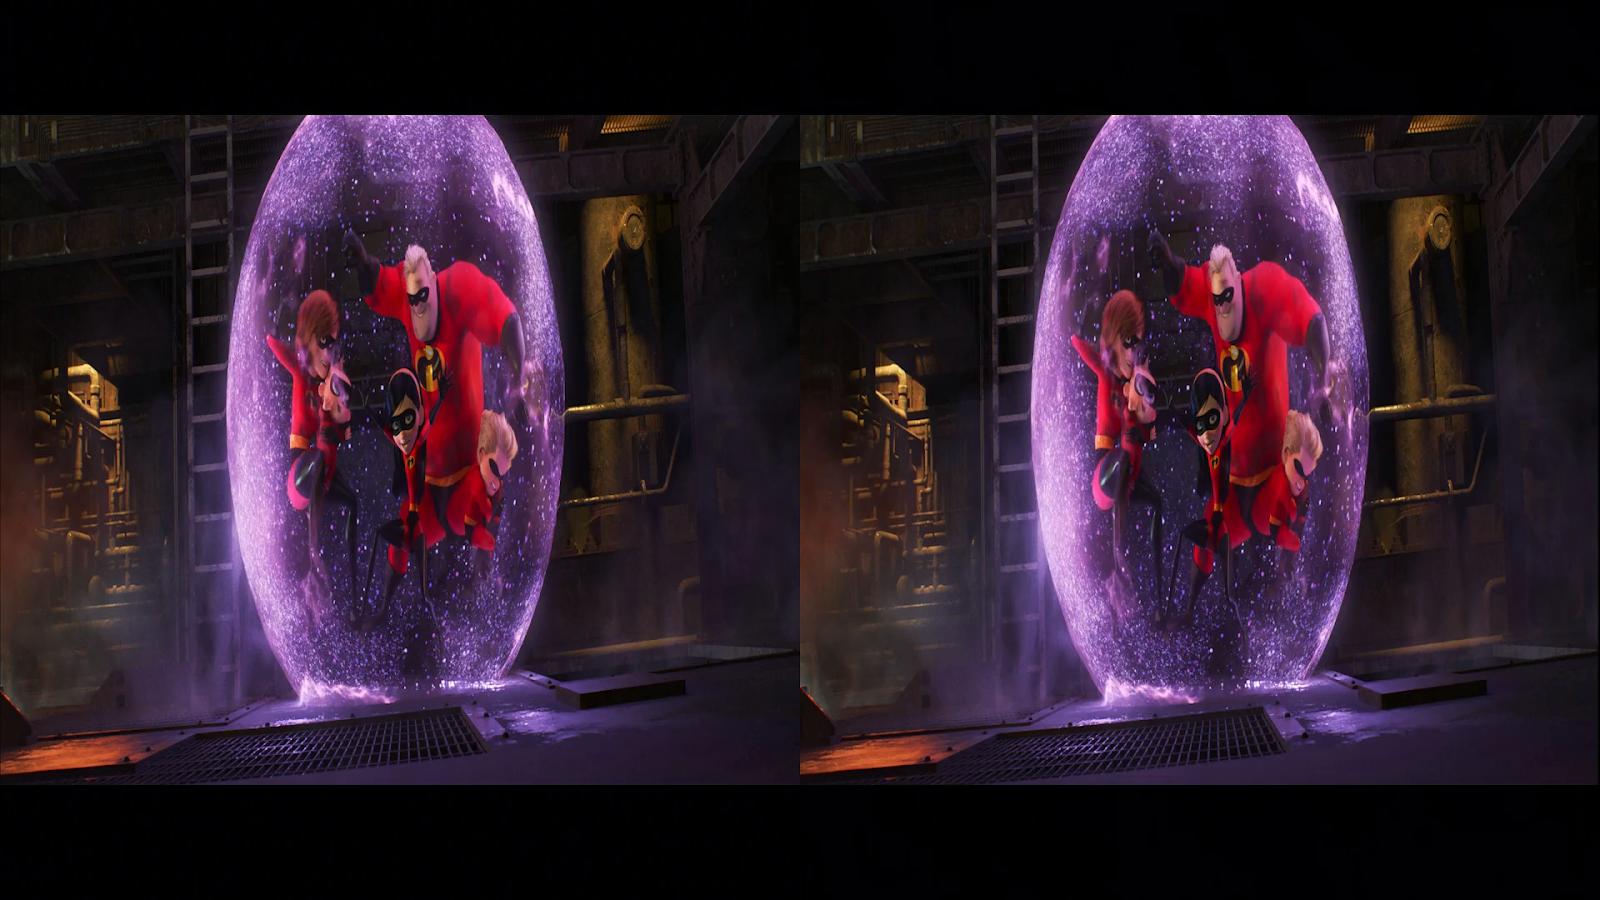 Los Increíbles 2 (2018) 3D SBS Full 1080p Latino-Ingles captura 1